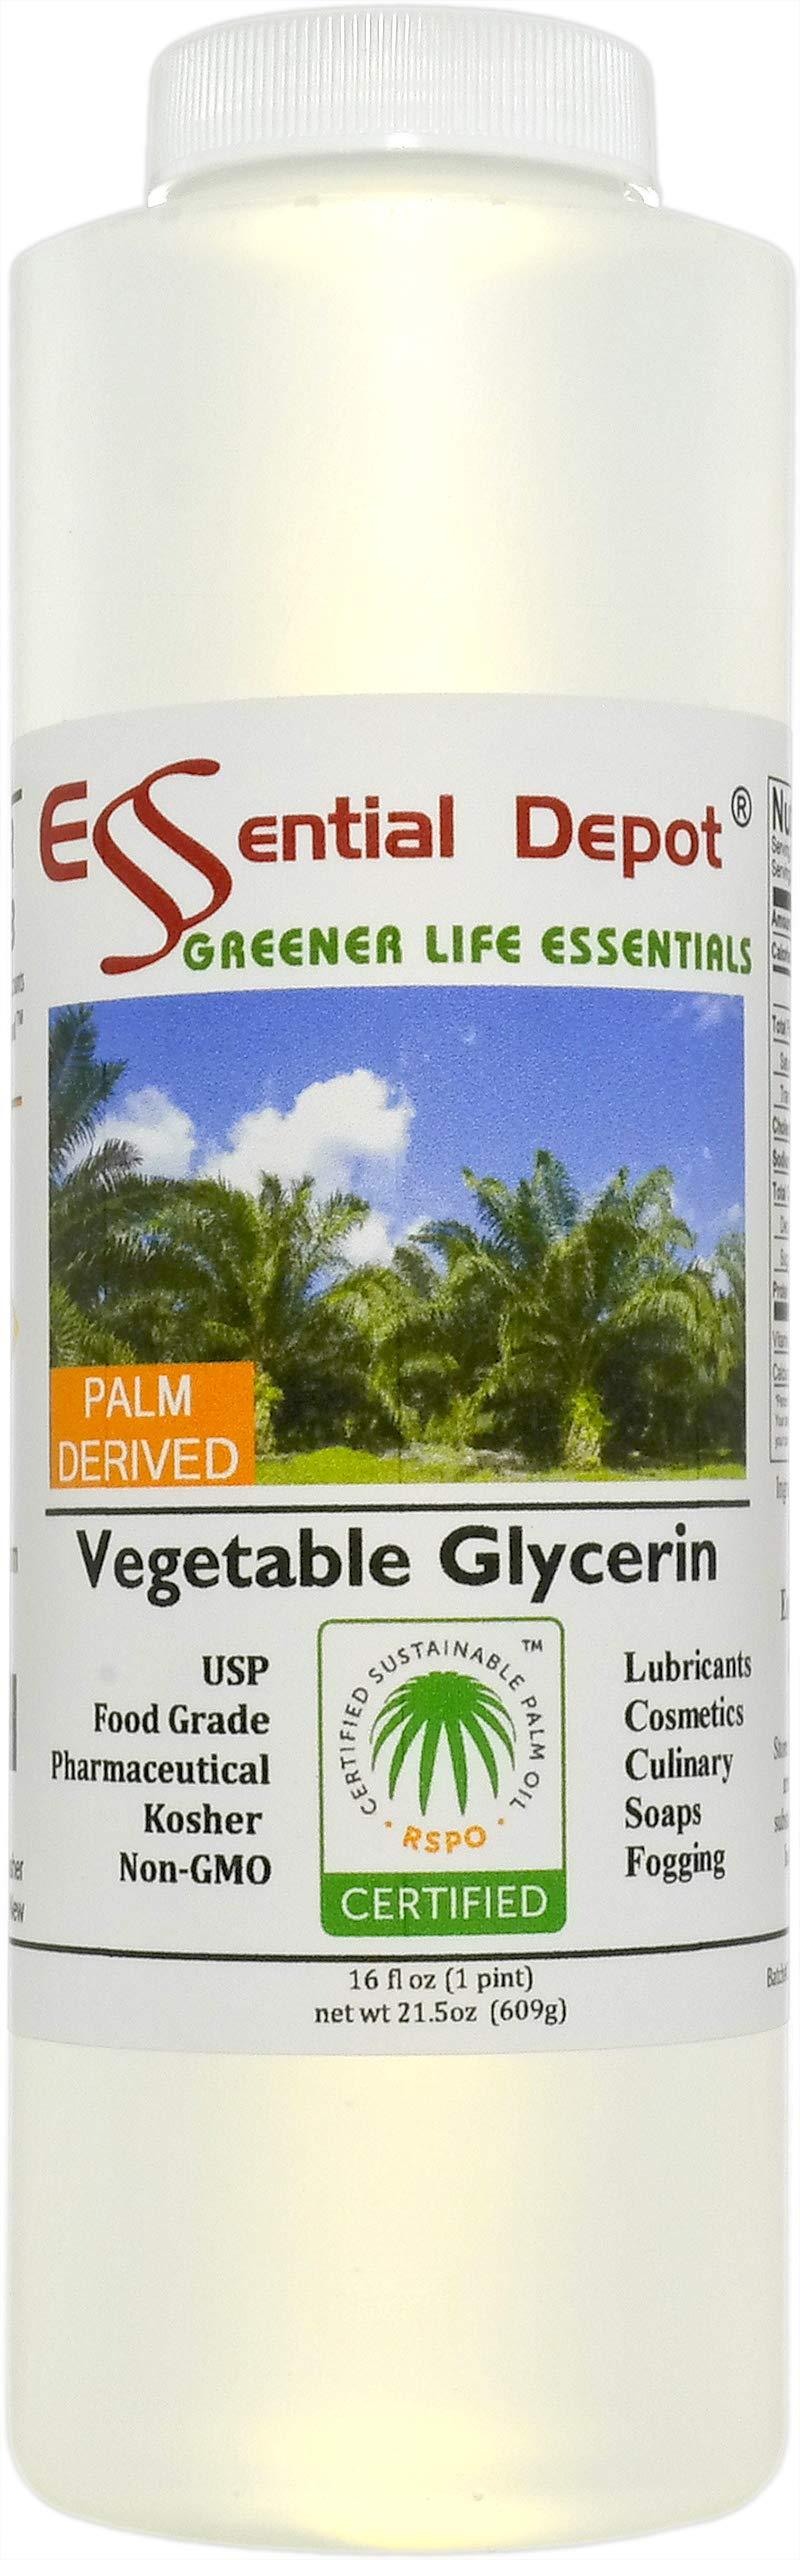 Glycerin Vegetable - 1 Pint (21.5 oz. net wt) - Non GMO - Sustainable Palm Based - USP - Kosher - Pure - Pharmaceutical Grade